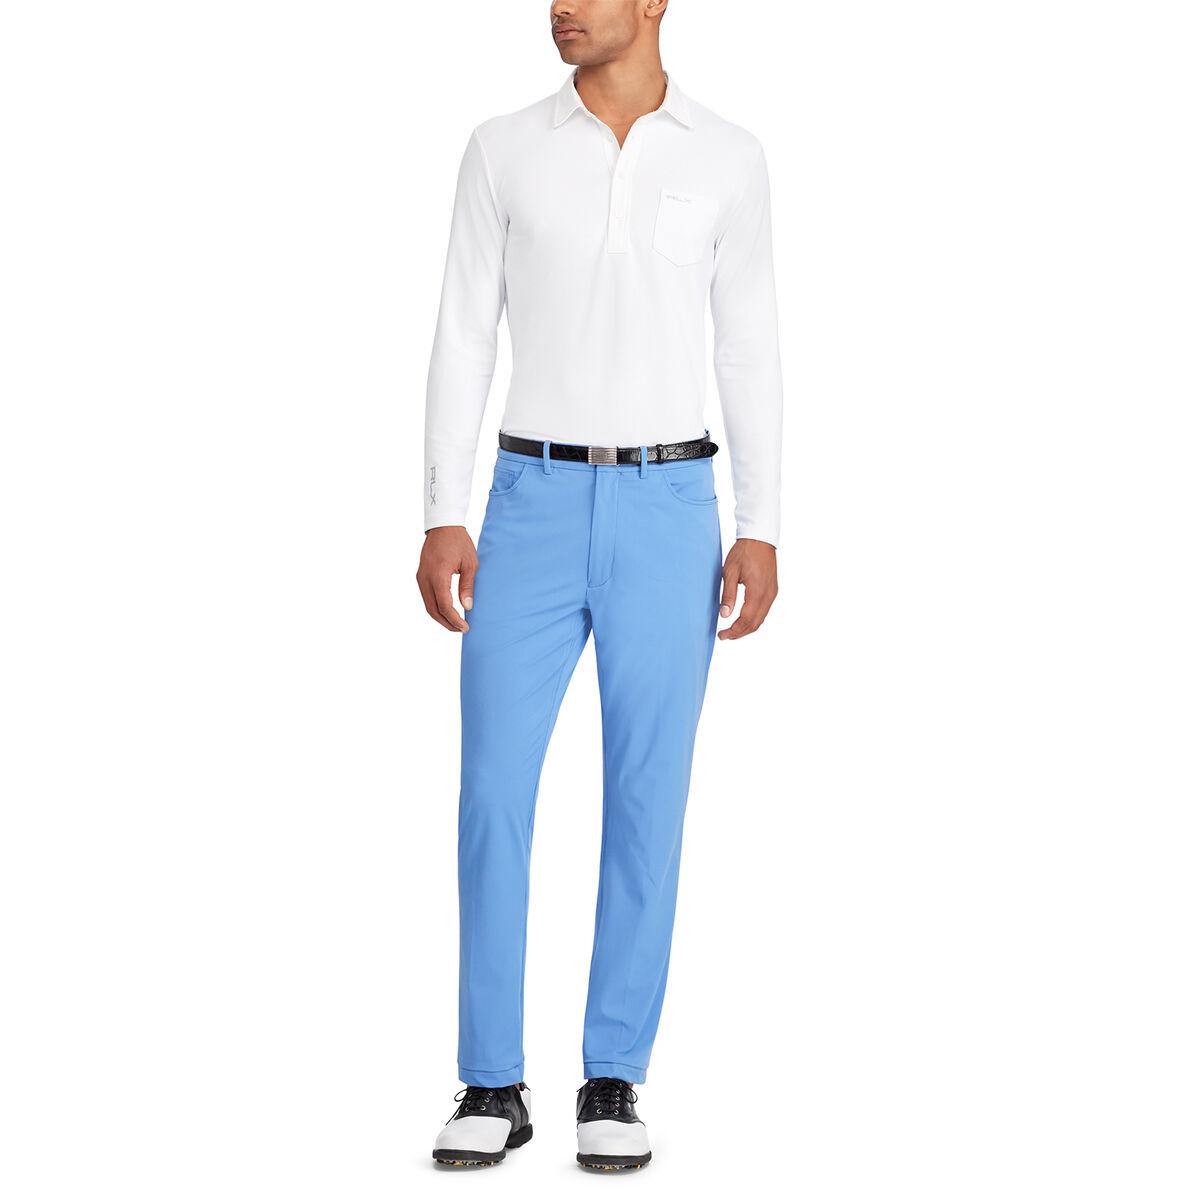 Rlx Golf Custom Slim Long Sleeve Polopga Tour Superstore